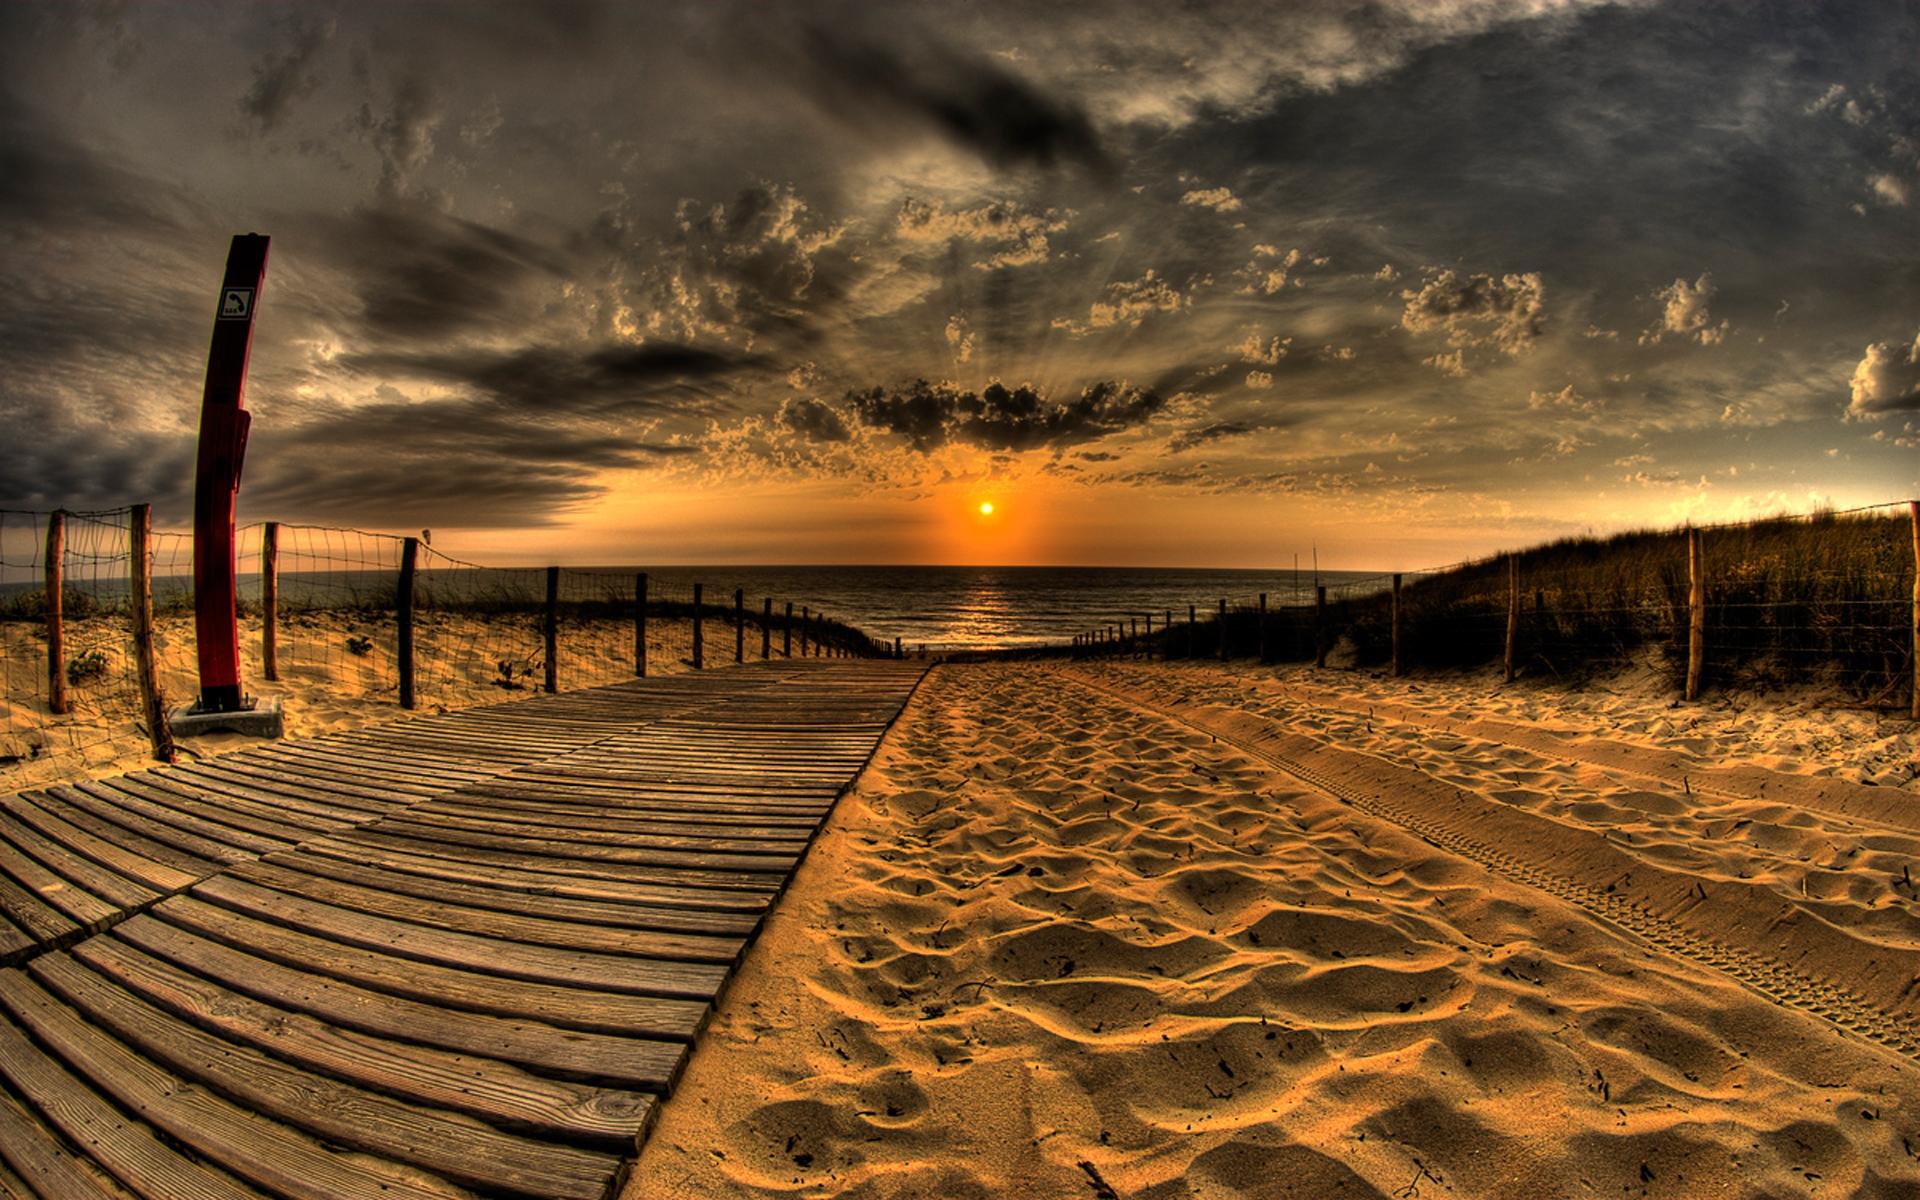 ... yellow sunset on the beach HD Desktop Wallpaper | HD Desktop Wallpaper